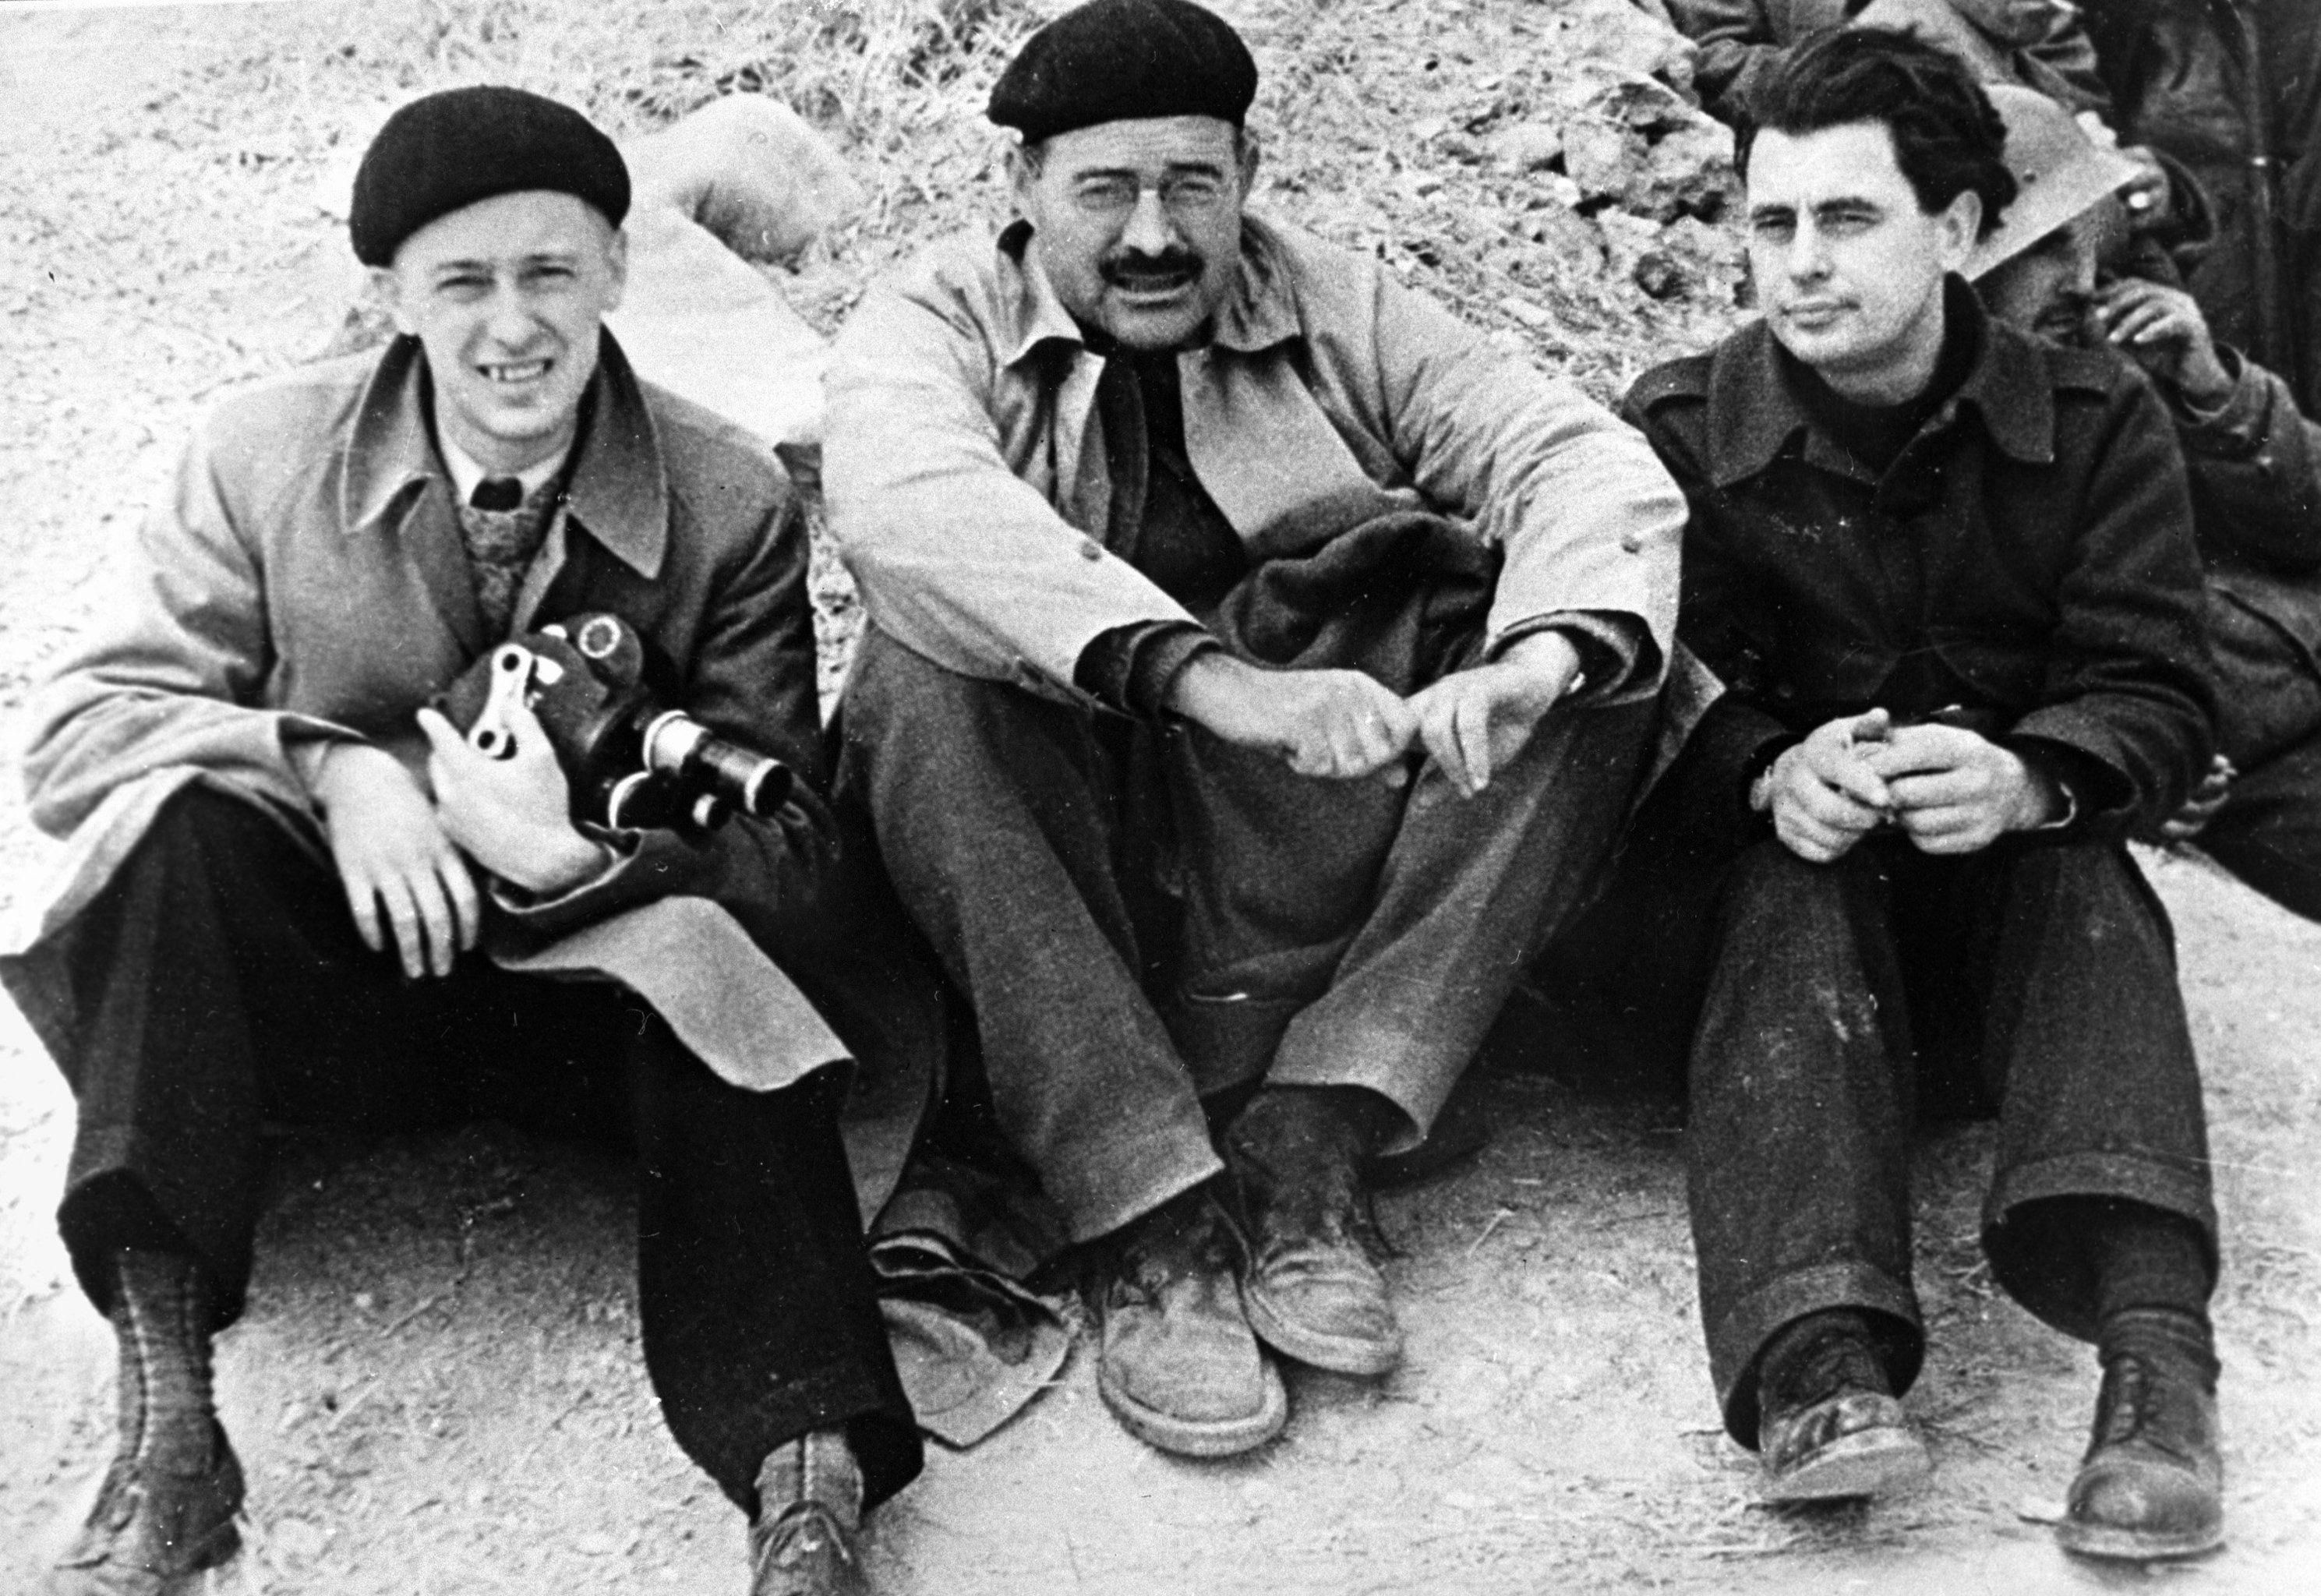 Guerra civil en España. Román Carmen (izda.), Ernest Hemingway (centro) y Ioris Iveno (drcha.)